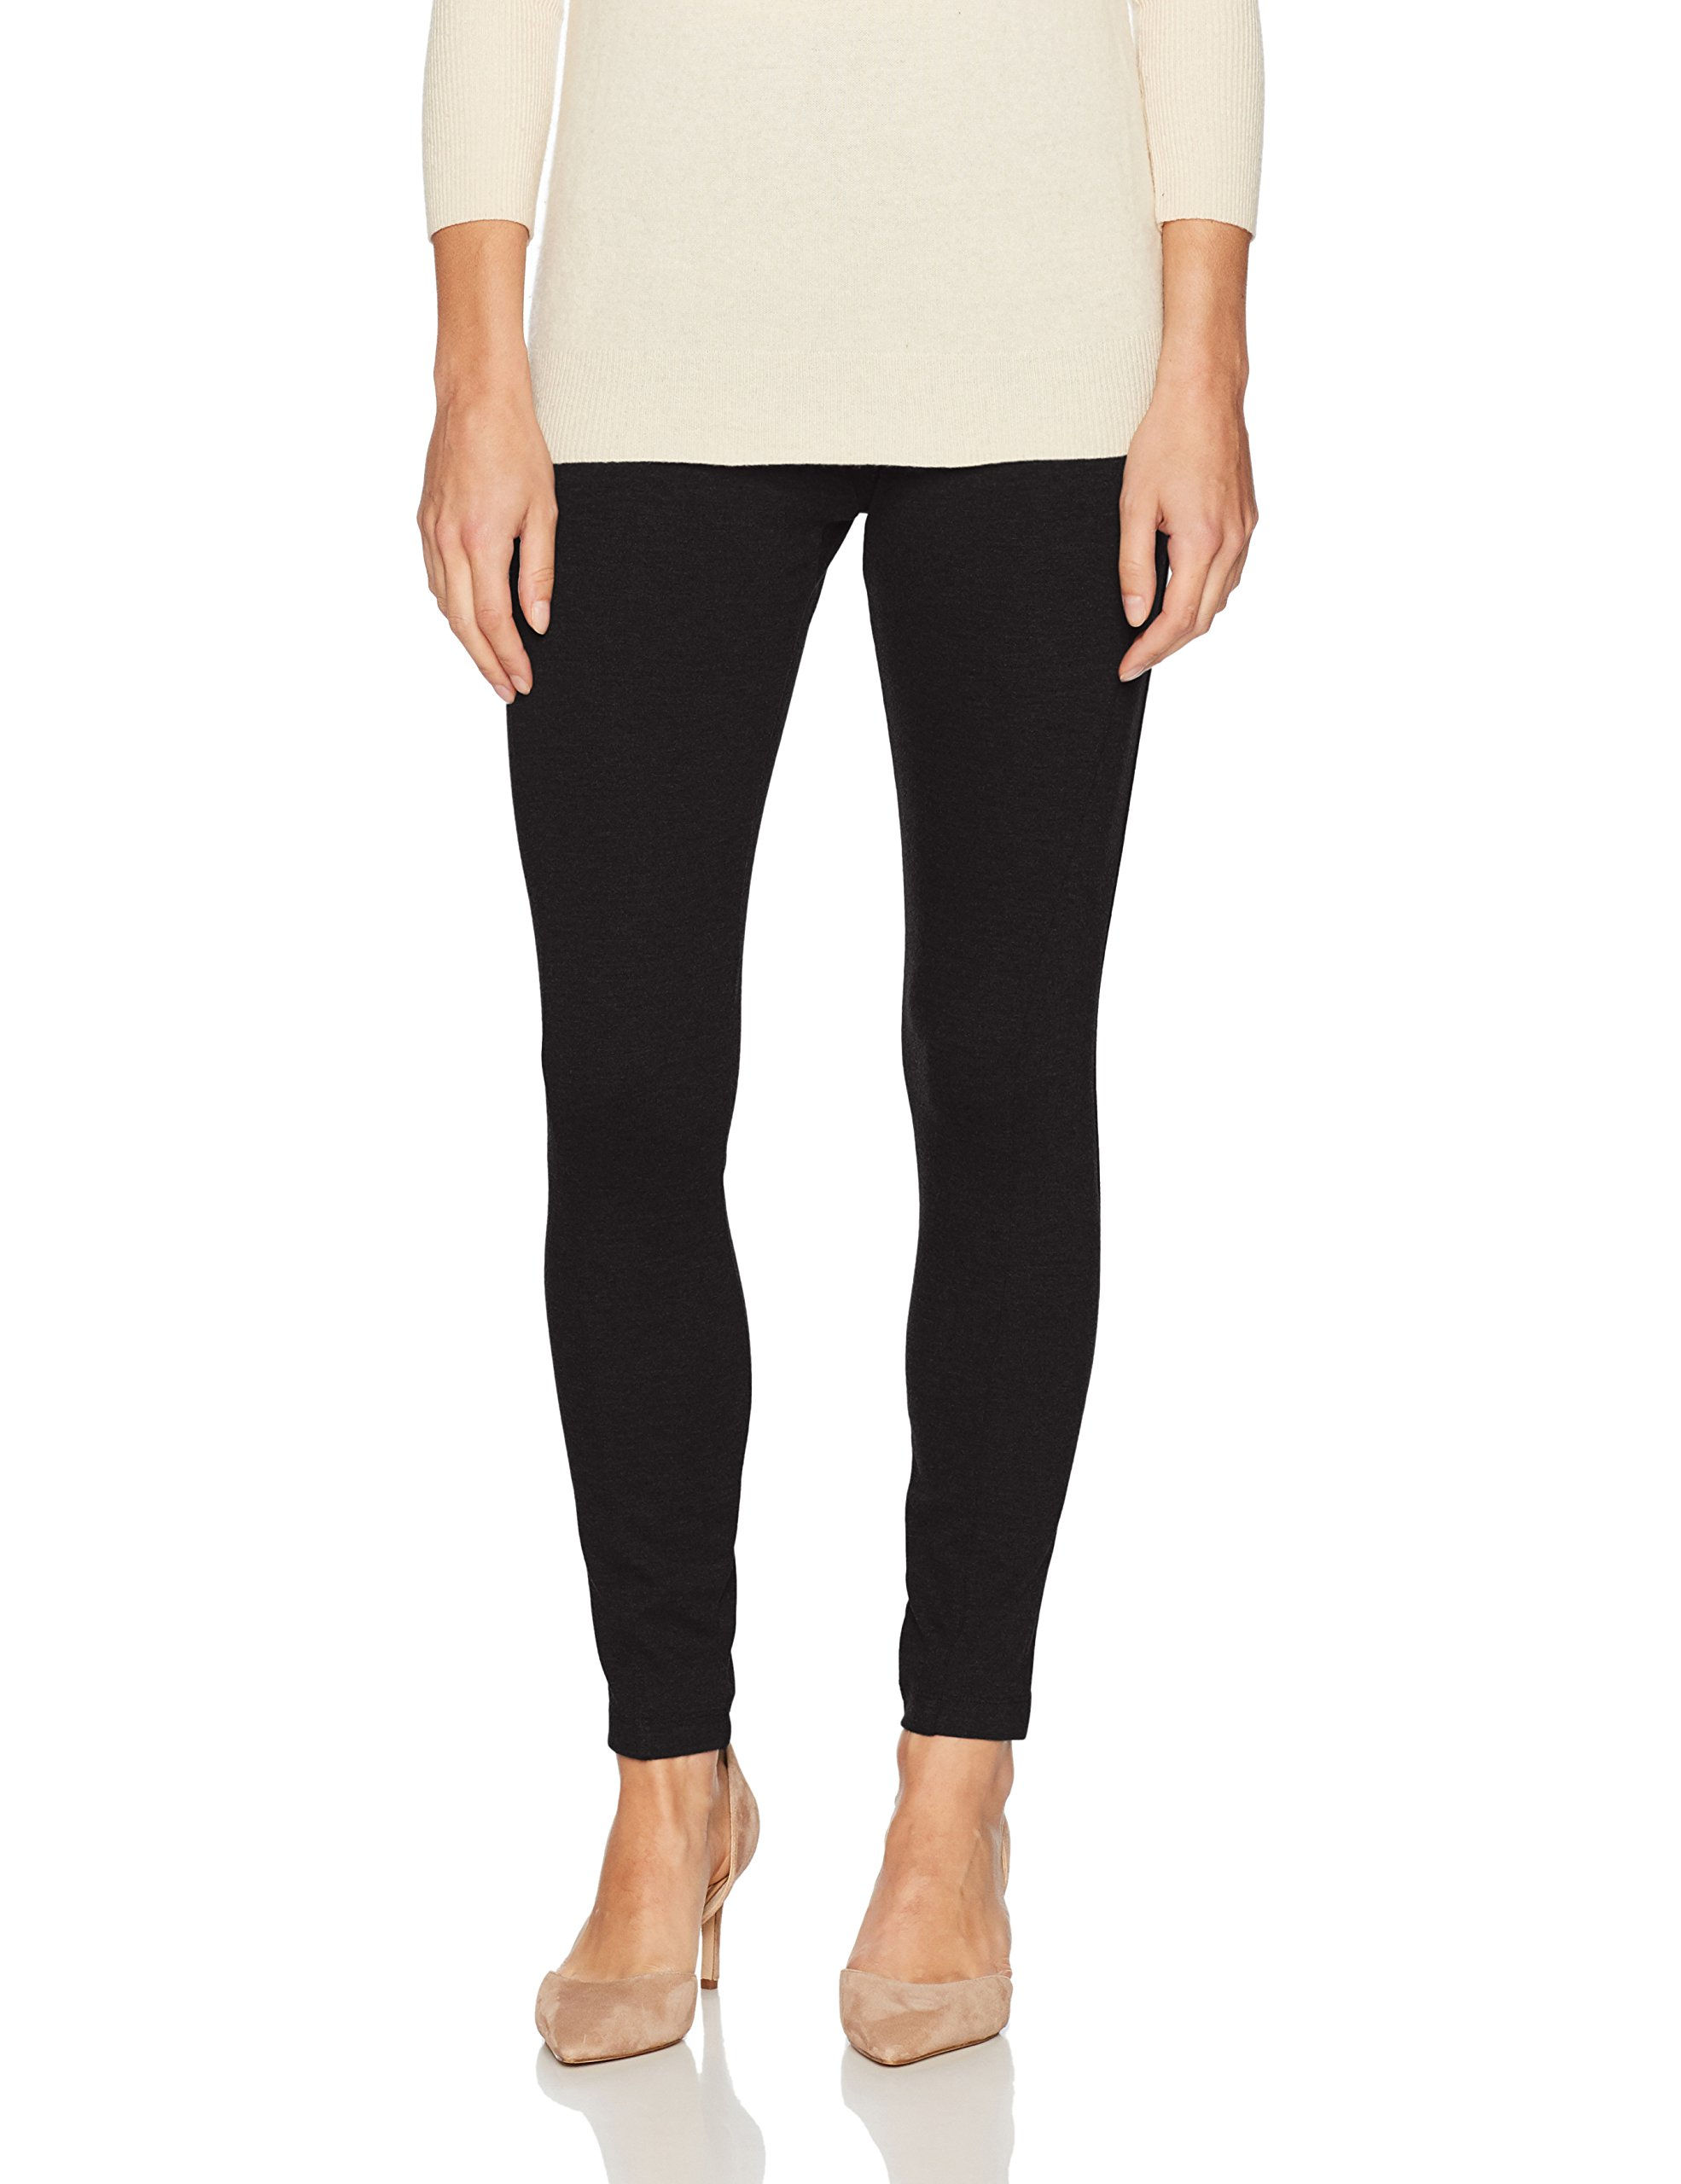 Lyssé Women's Ella Seamed Ponte Legging, Black, S